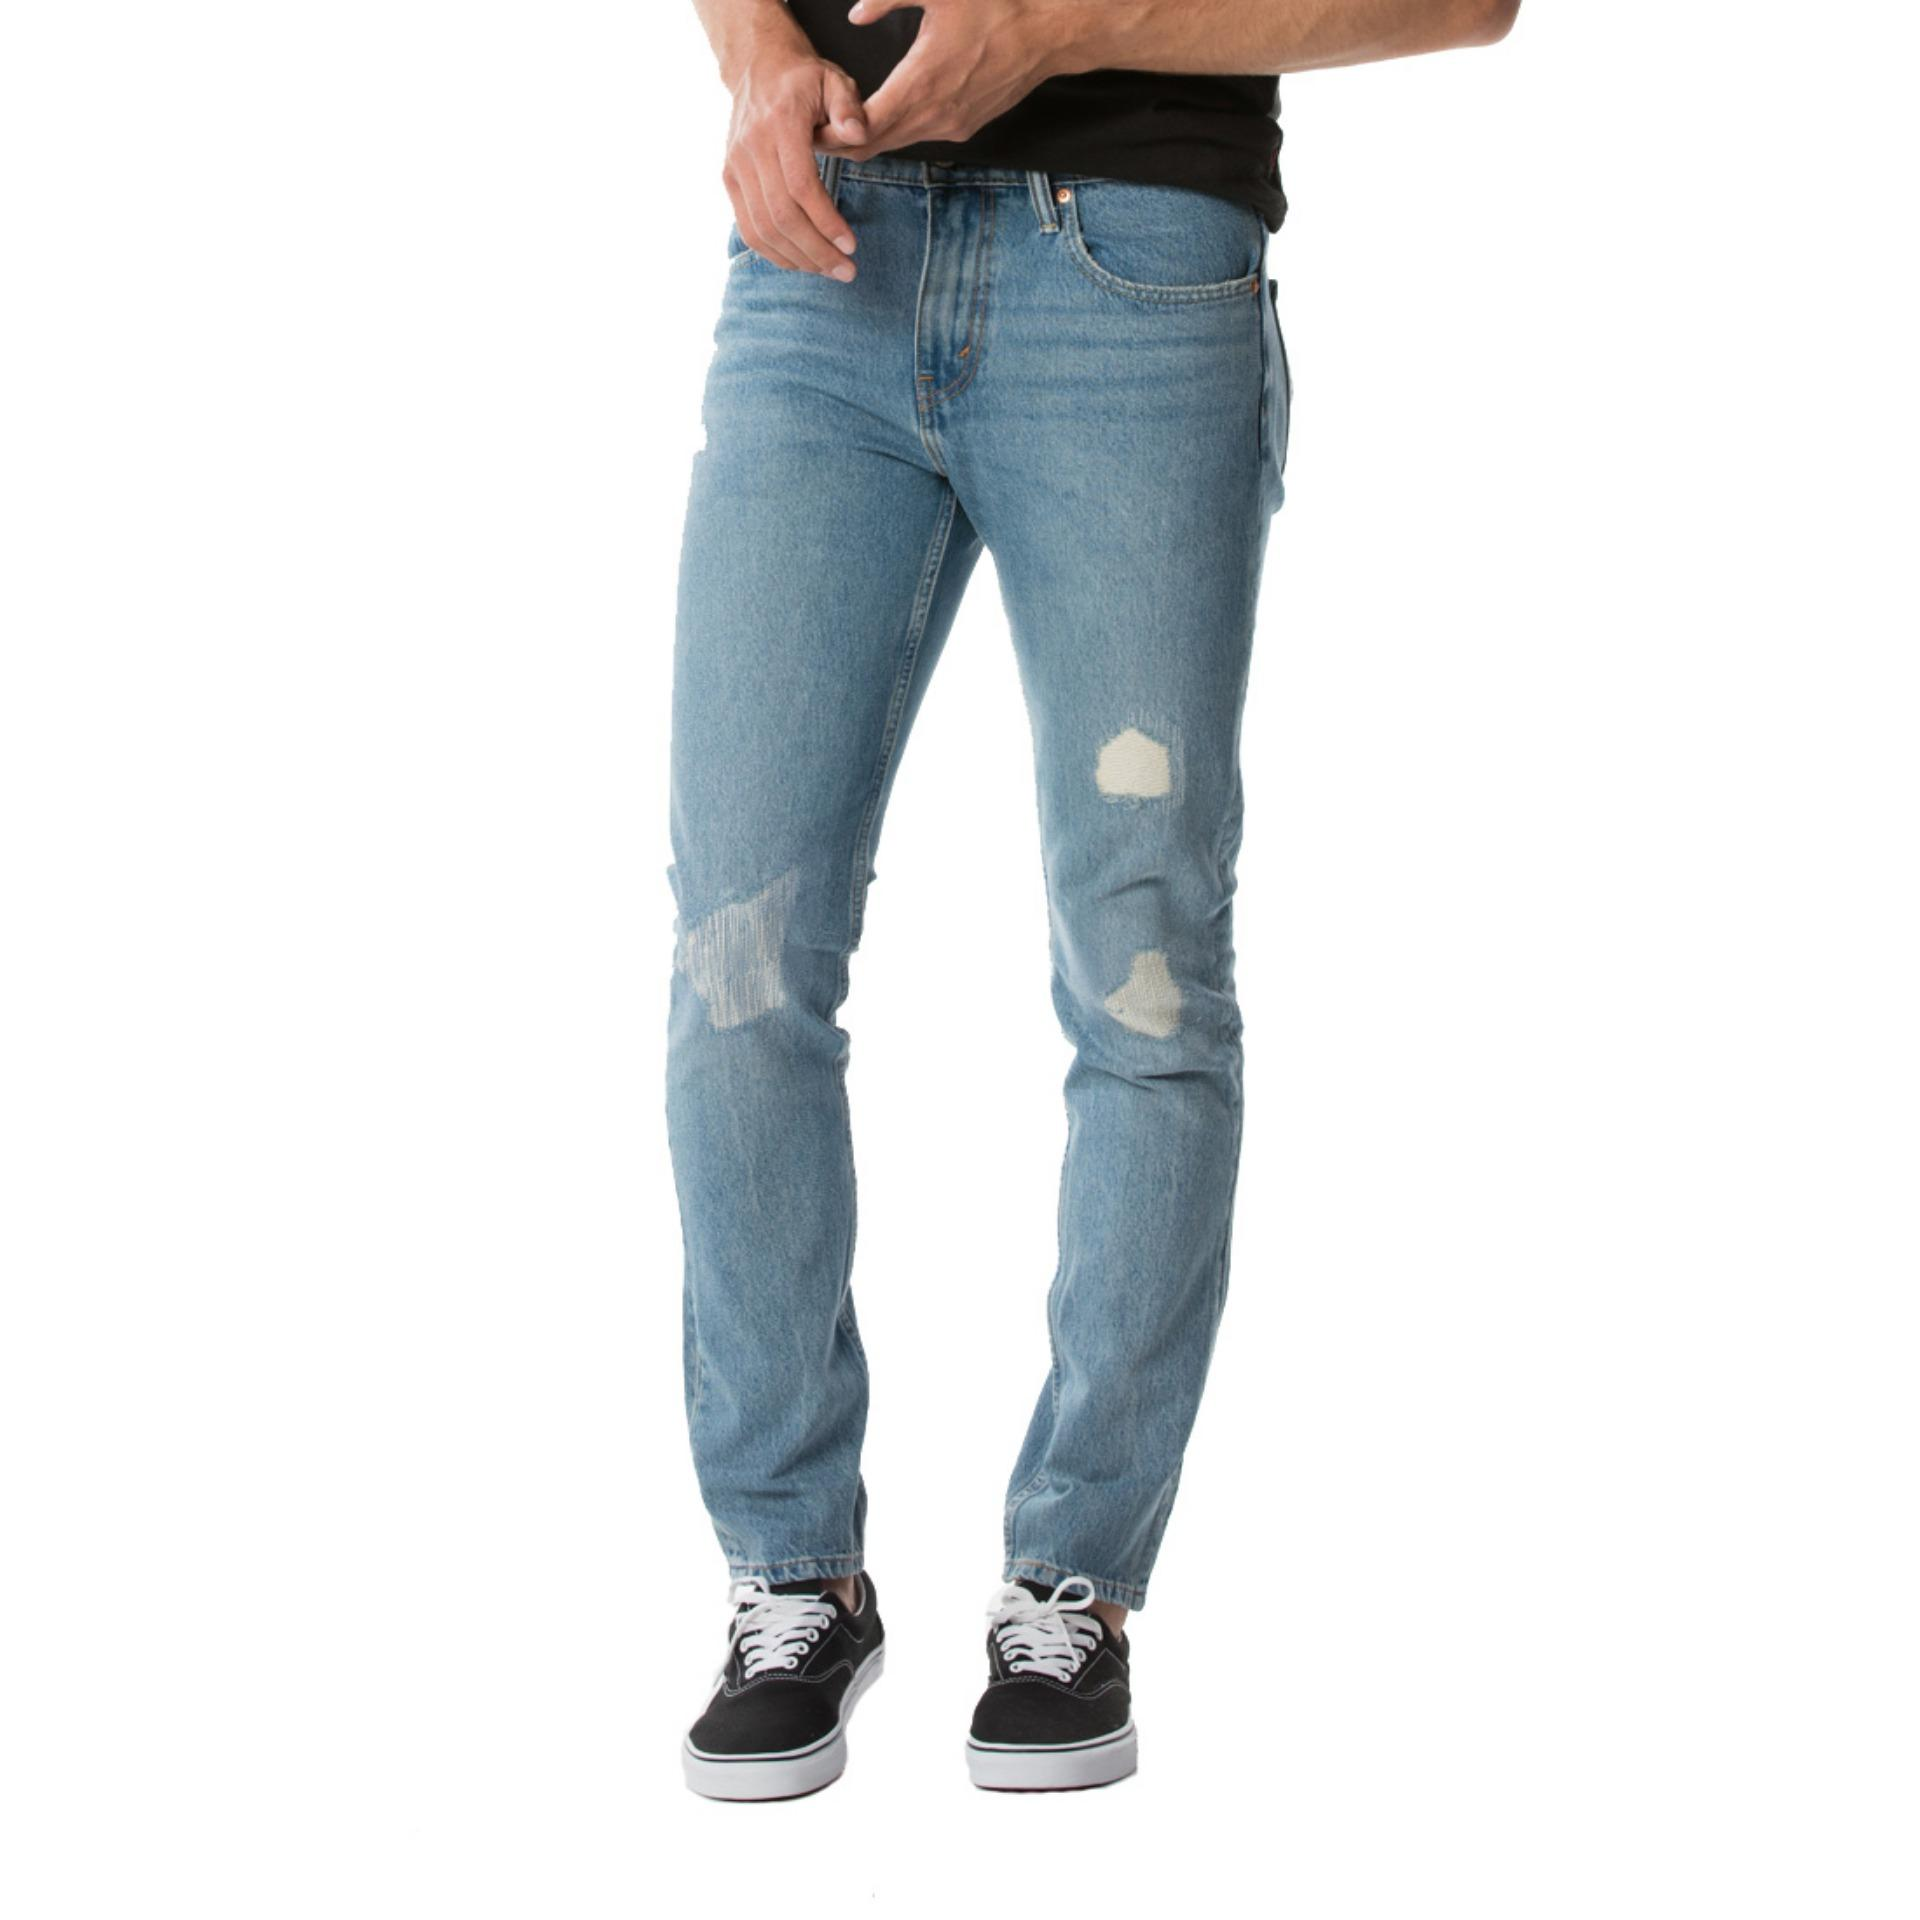 Cek Harga Levis 712 Slim Jeans Sunset Cove Dan Ulasan Terbaru One Pocket Shirt True Blue 65824 0337 512 Taper Fit Animus